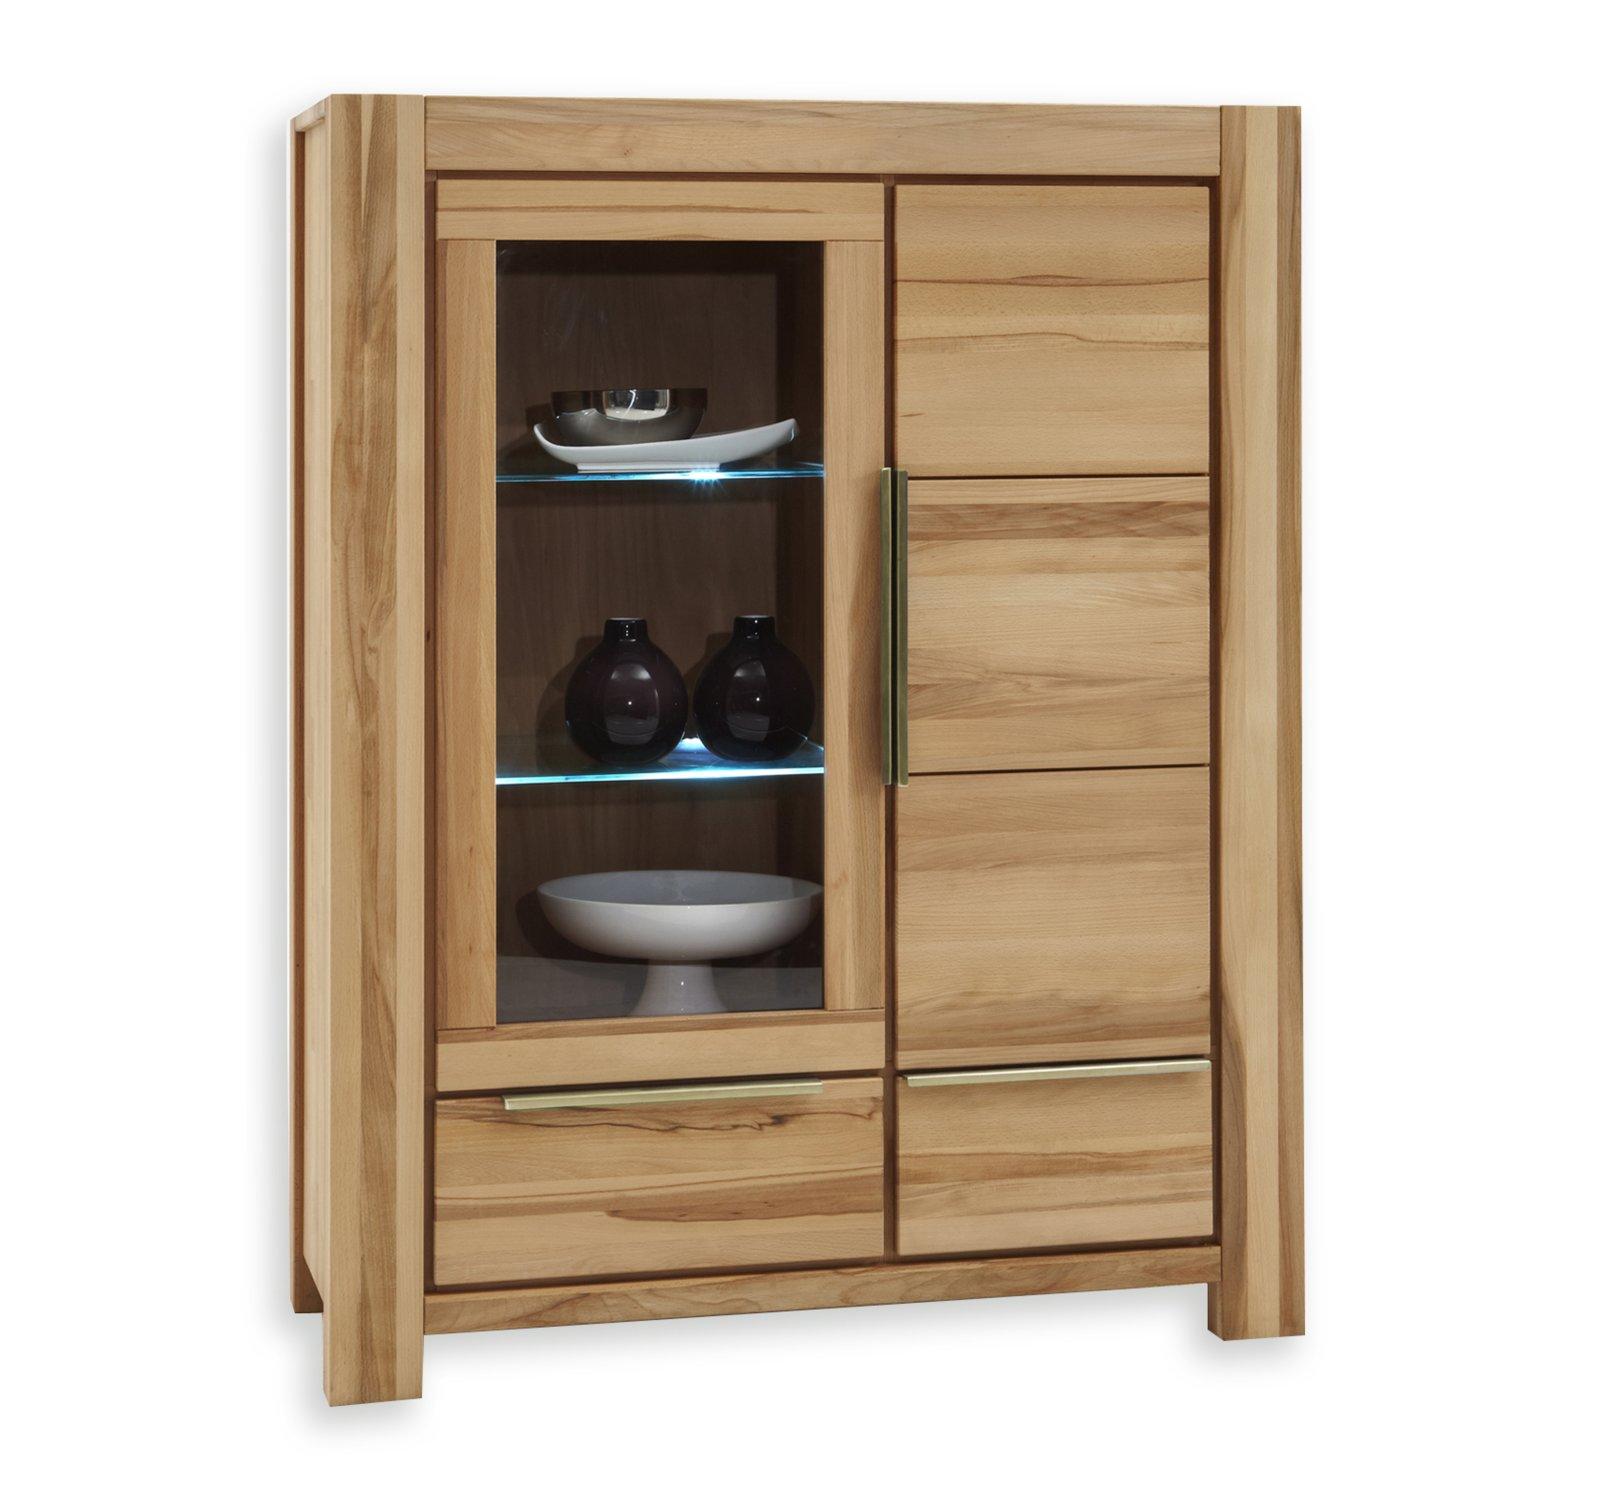 vitrinenschrank nena vitrinen m bel m belhaus roller. Black Bedroom Furniture Sets. Home Design Ideas